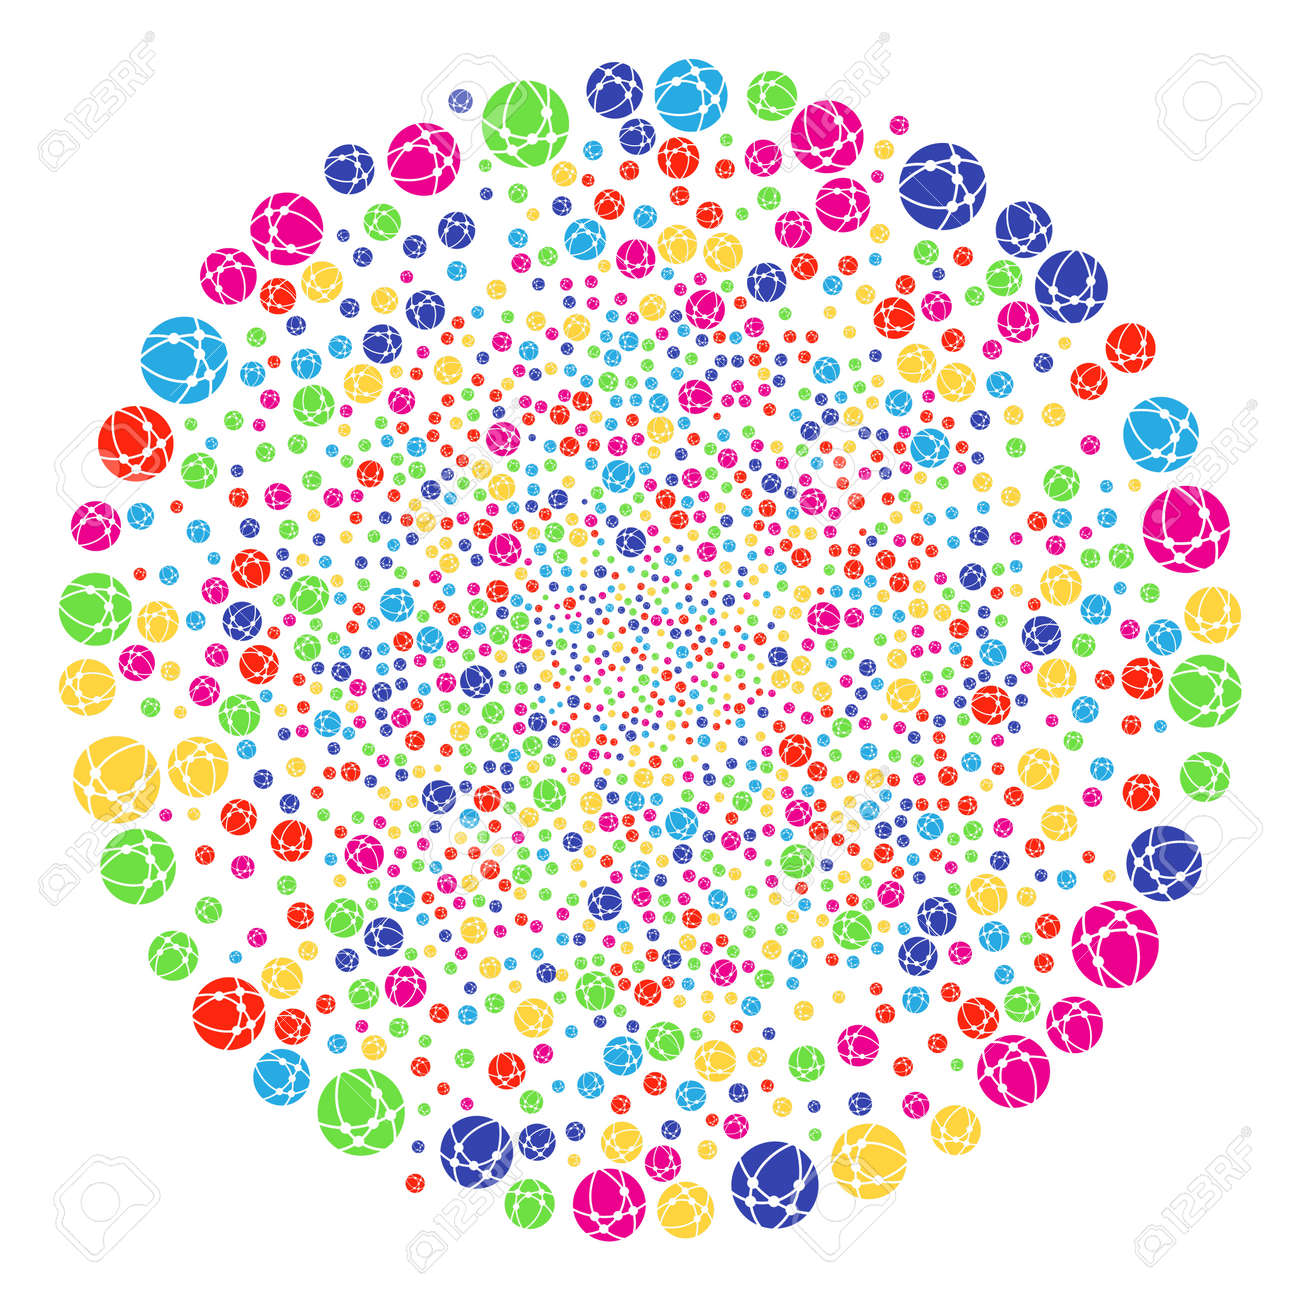 Multi Colored Web Browser Explosion Globula Raster Spheric Cluster